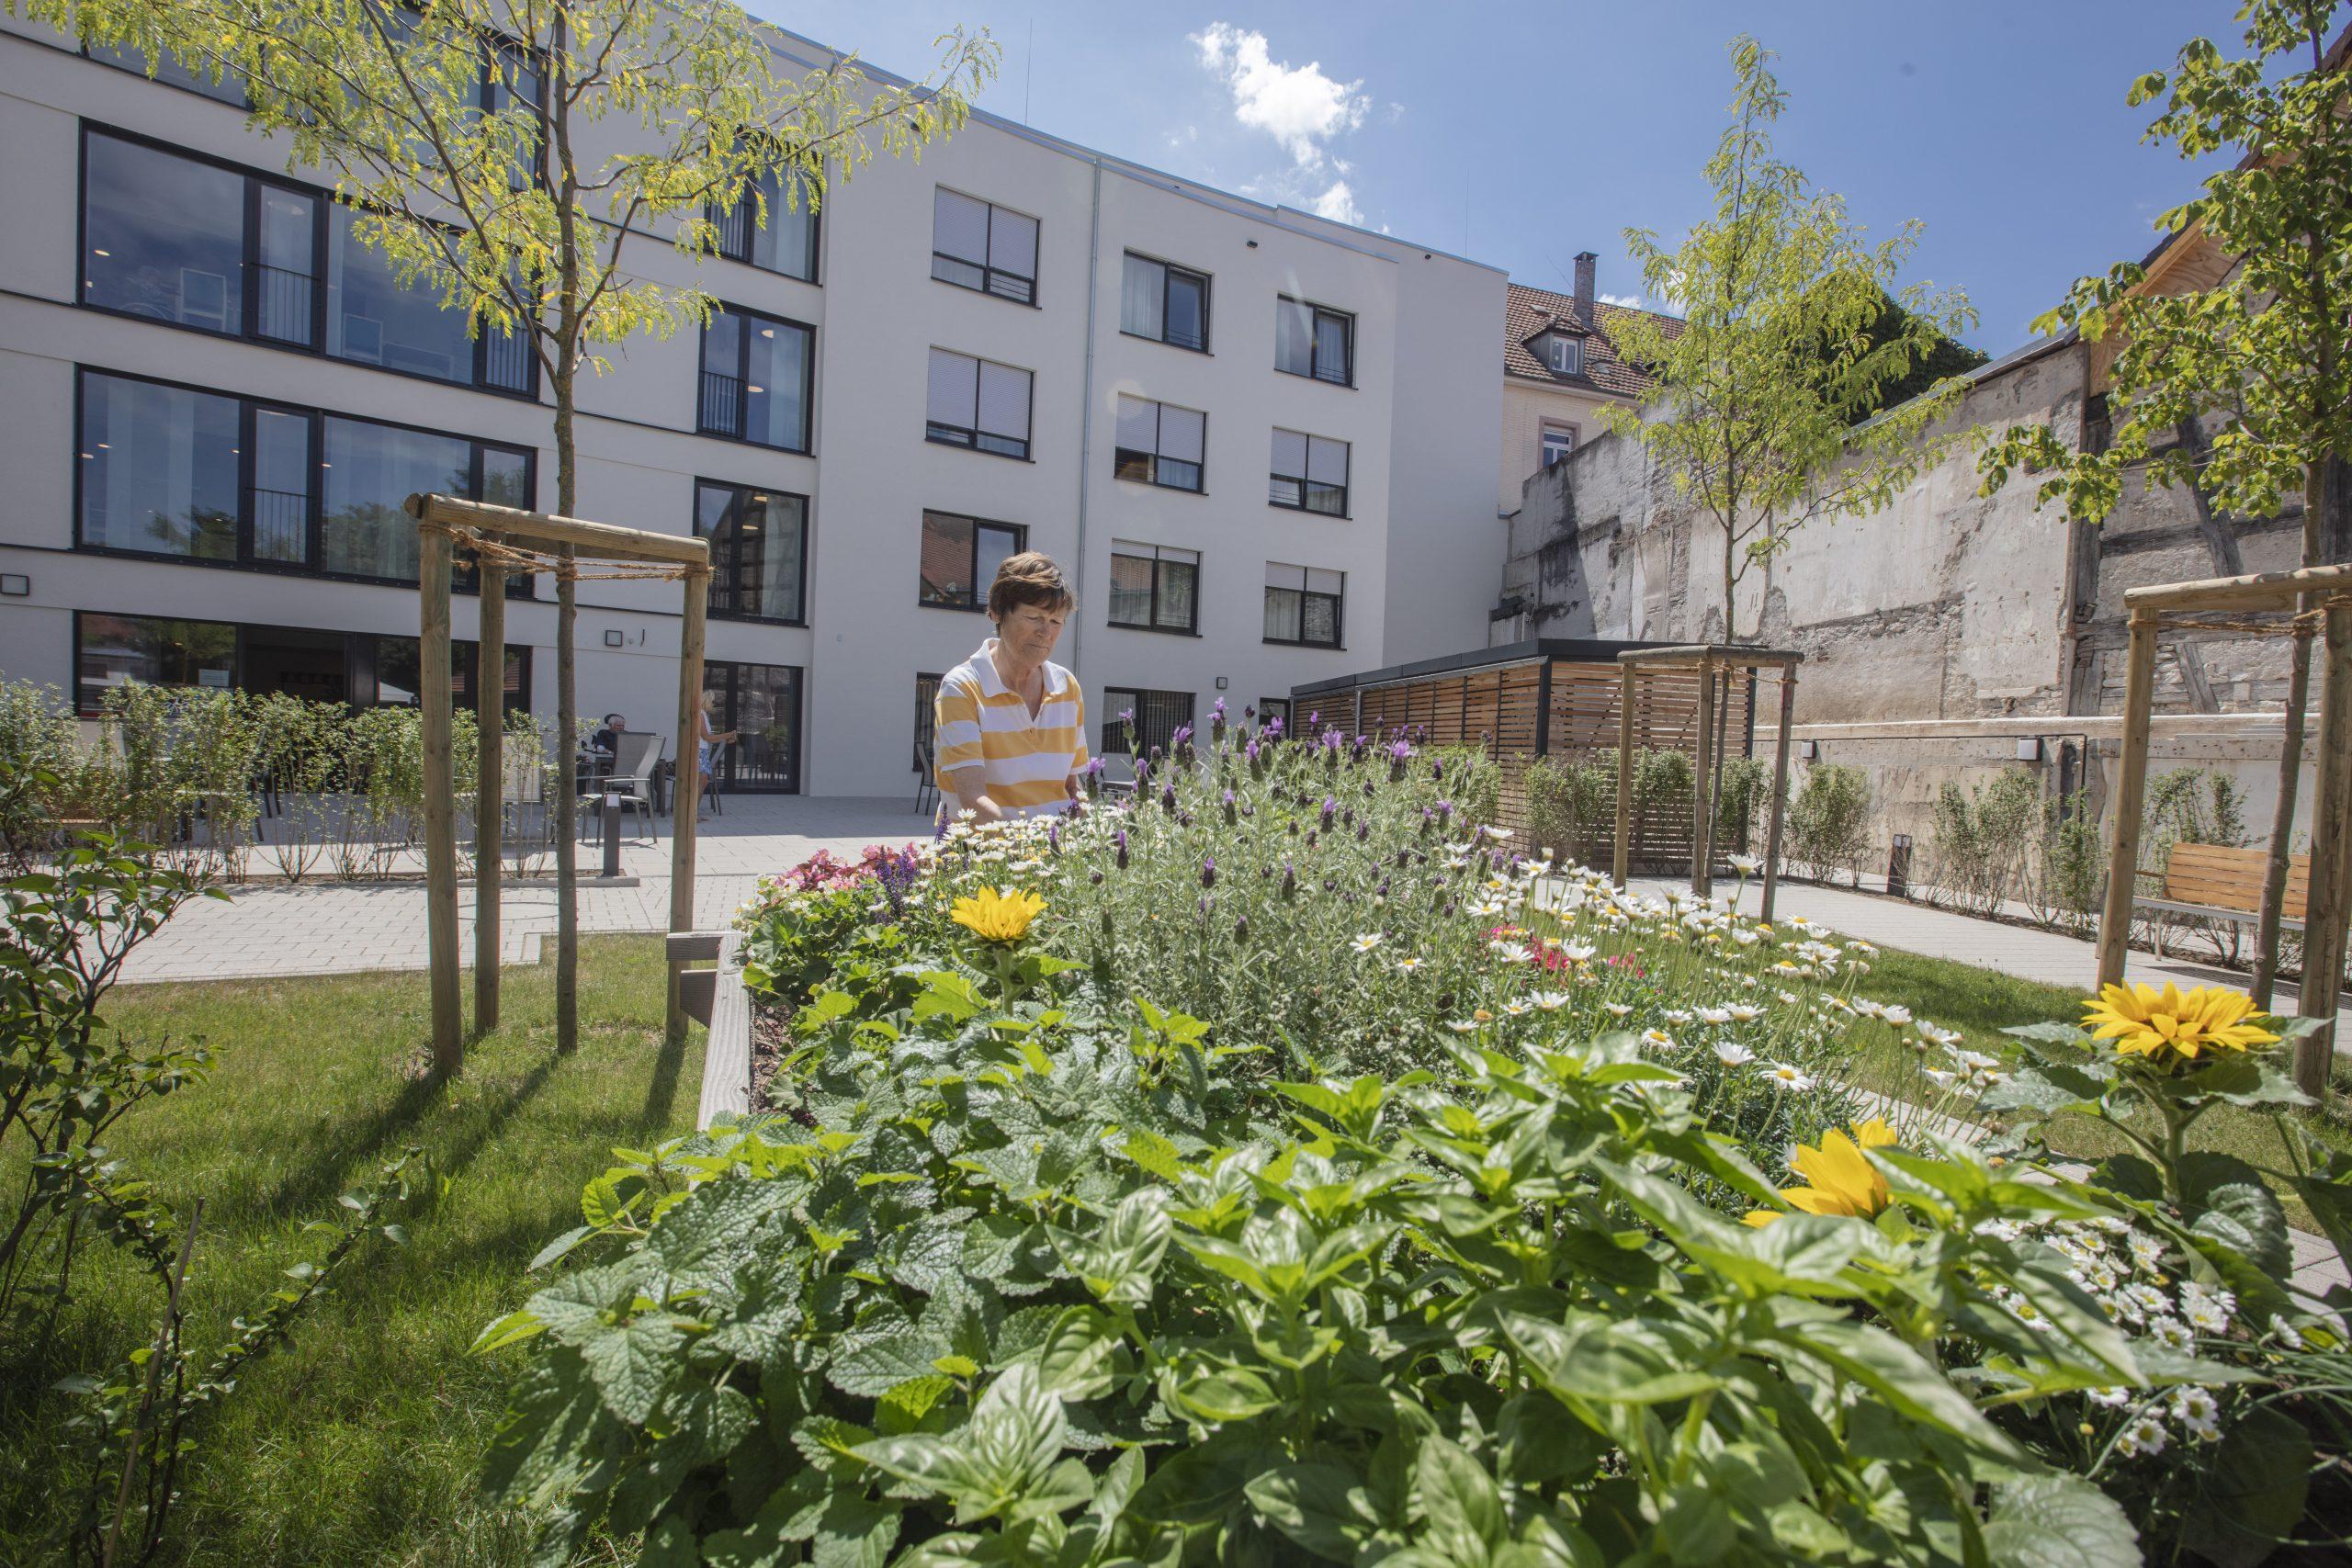 Garten Anna Leimbach Haus 2 scaled AWO Karlsruhe